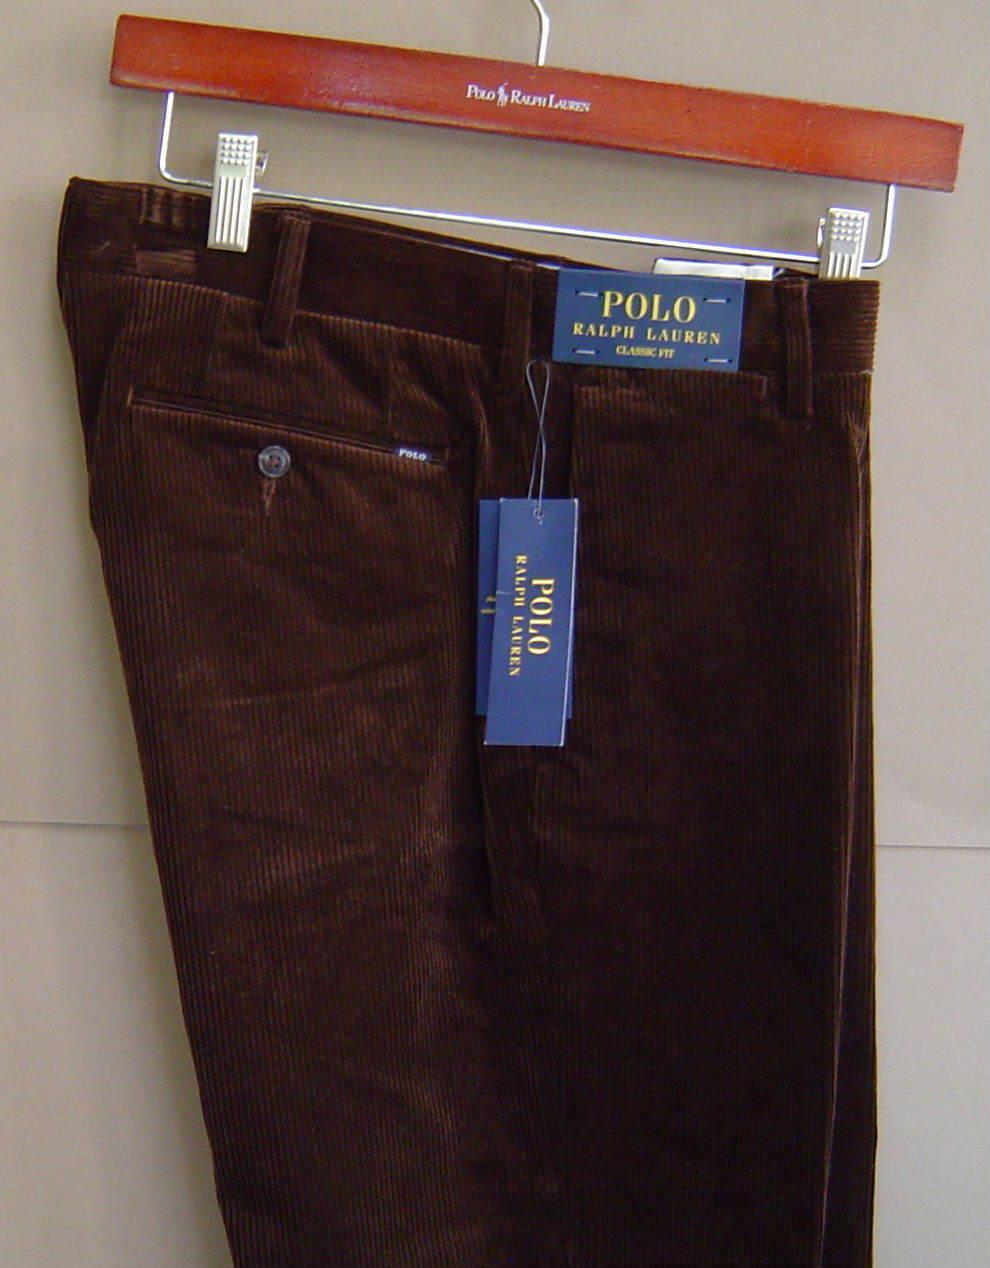 NWT  POLO RALPH LAUREN Mens 30 30 CLASSIC FIT Newport Corduroy Pants BROWN